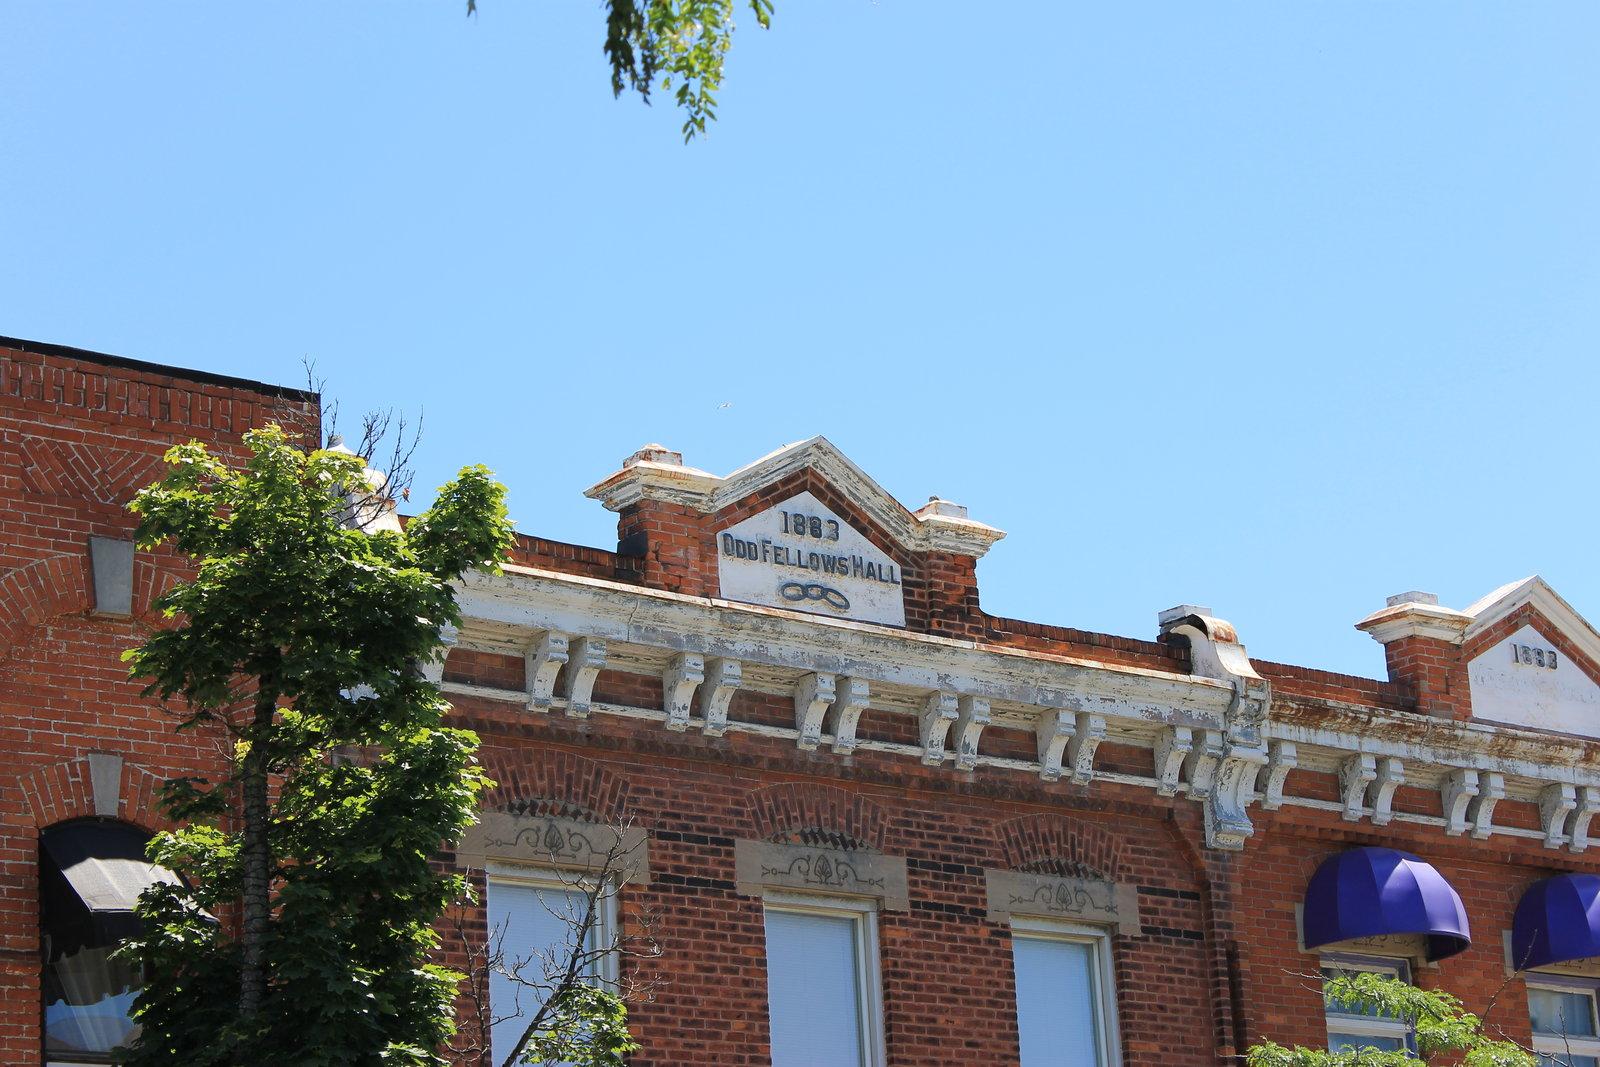 Oddfellows Hall Inscription, Current